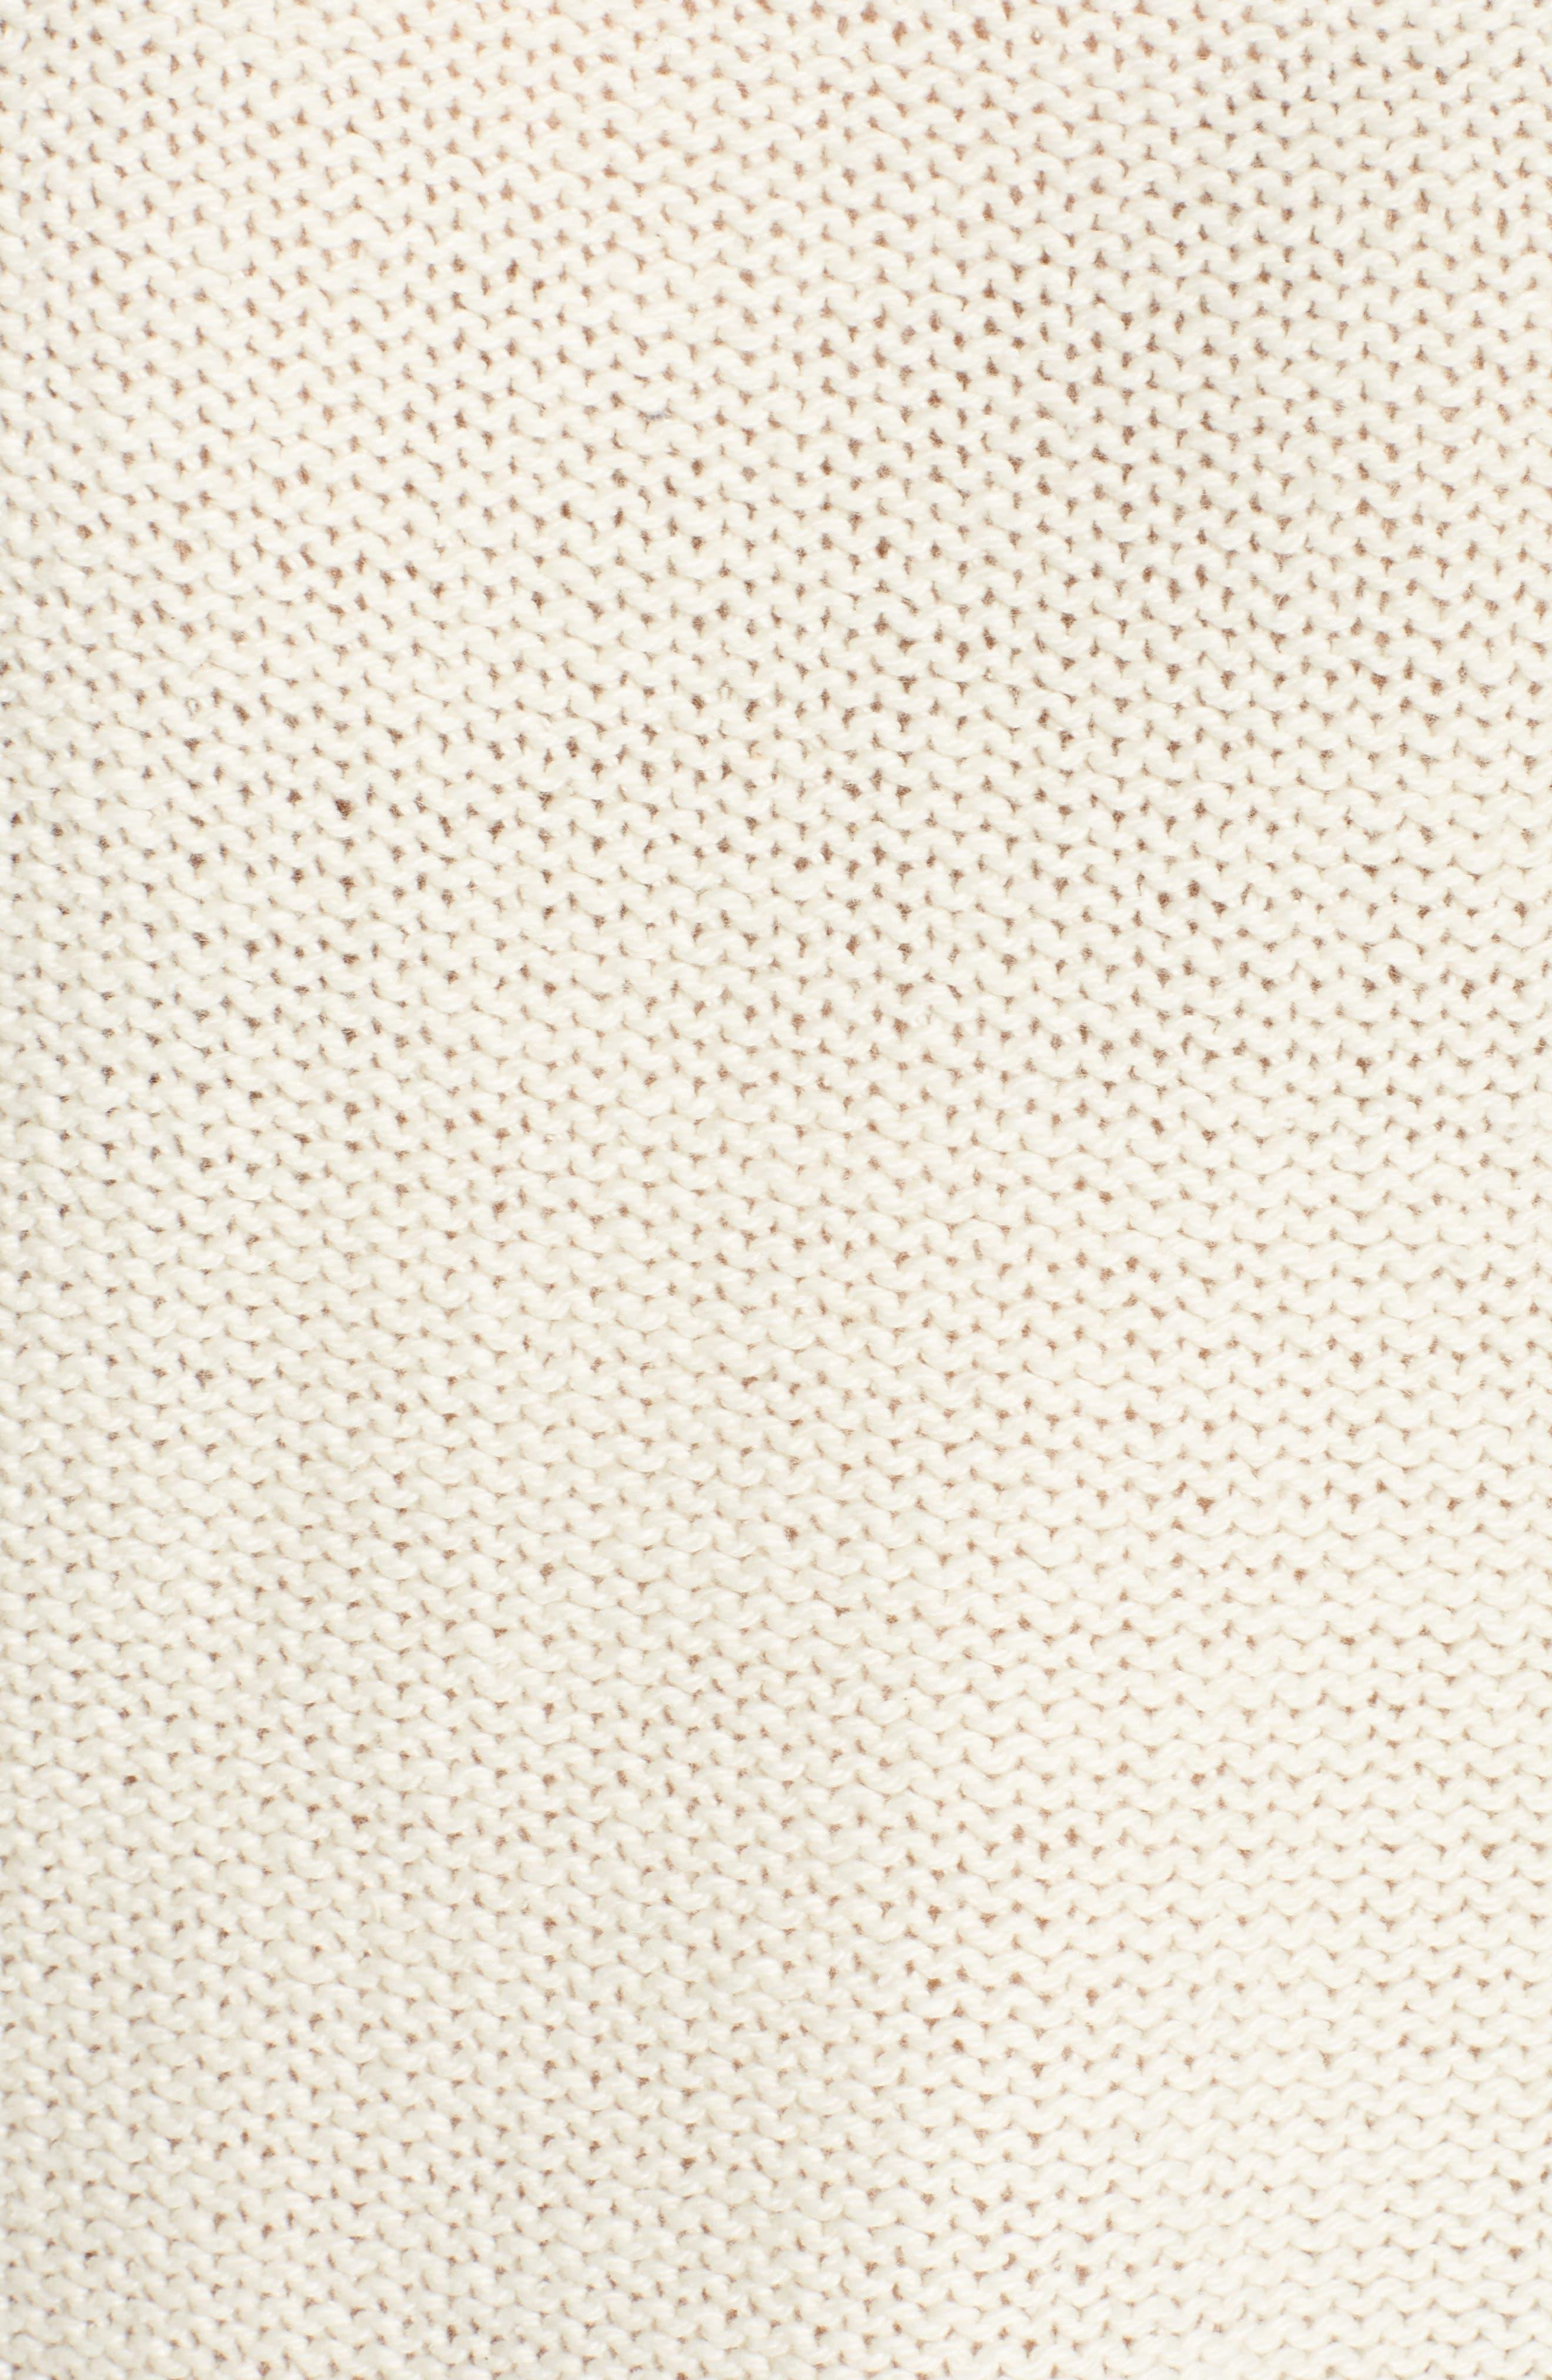 Flecked Turtleneck Sweater,                             Alternate thumbnail 5, color,                             100